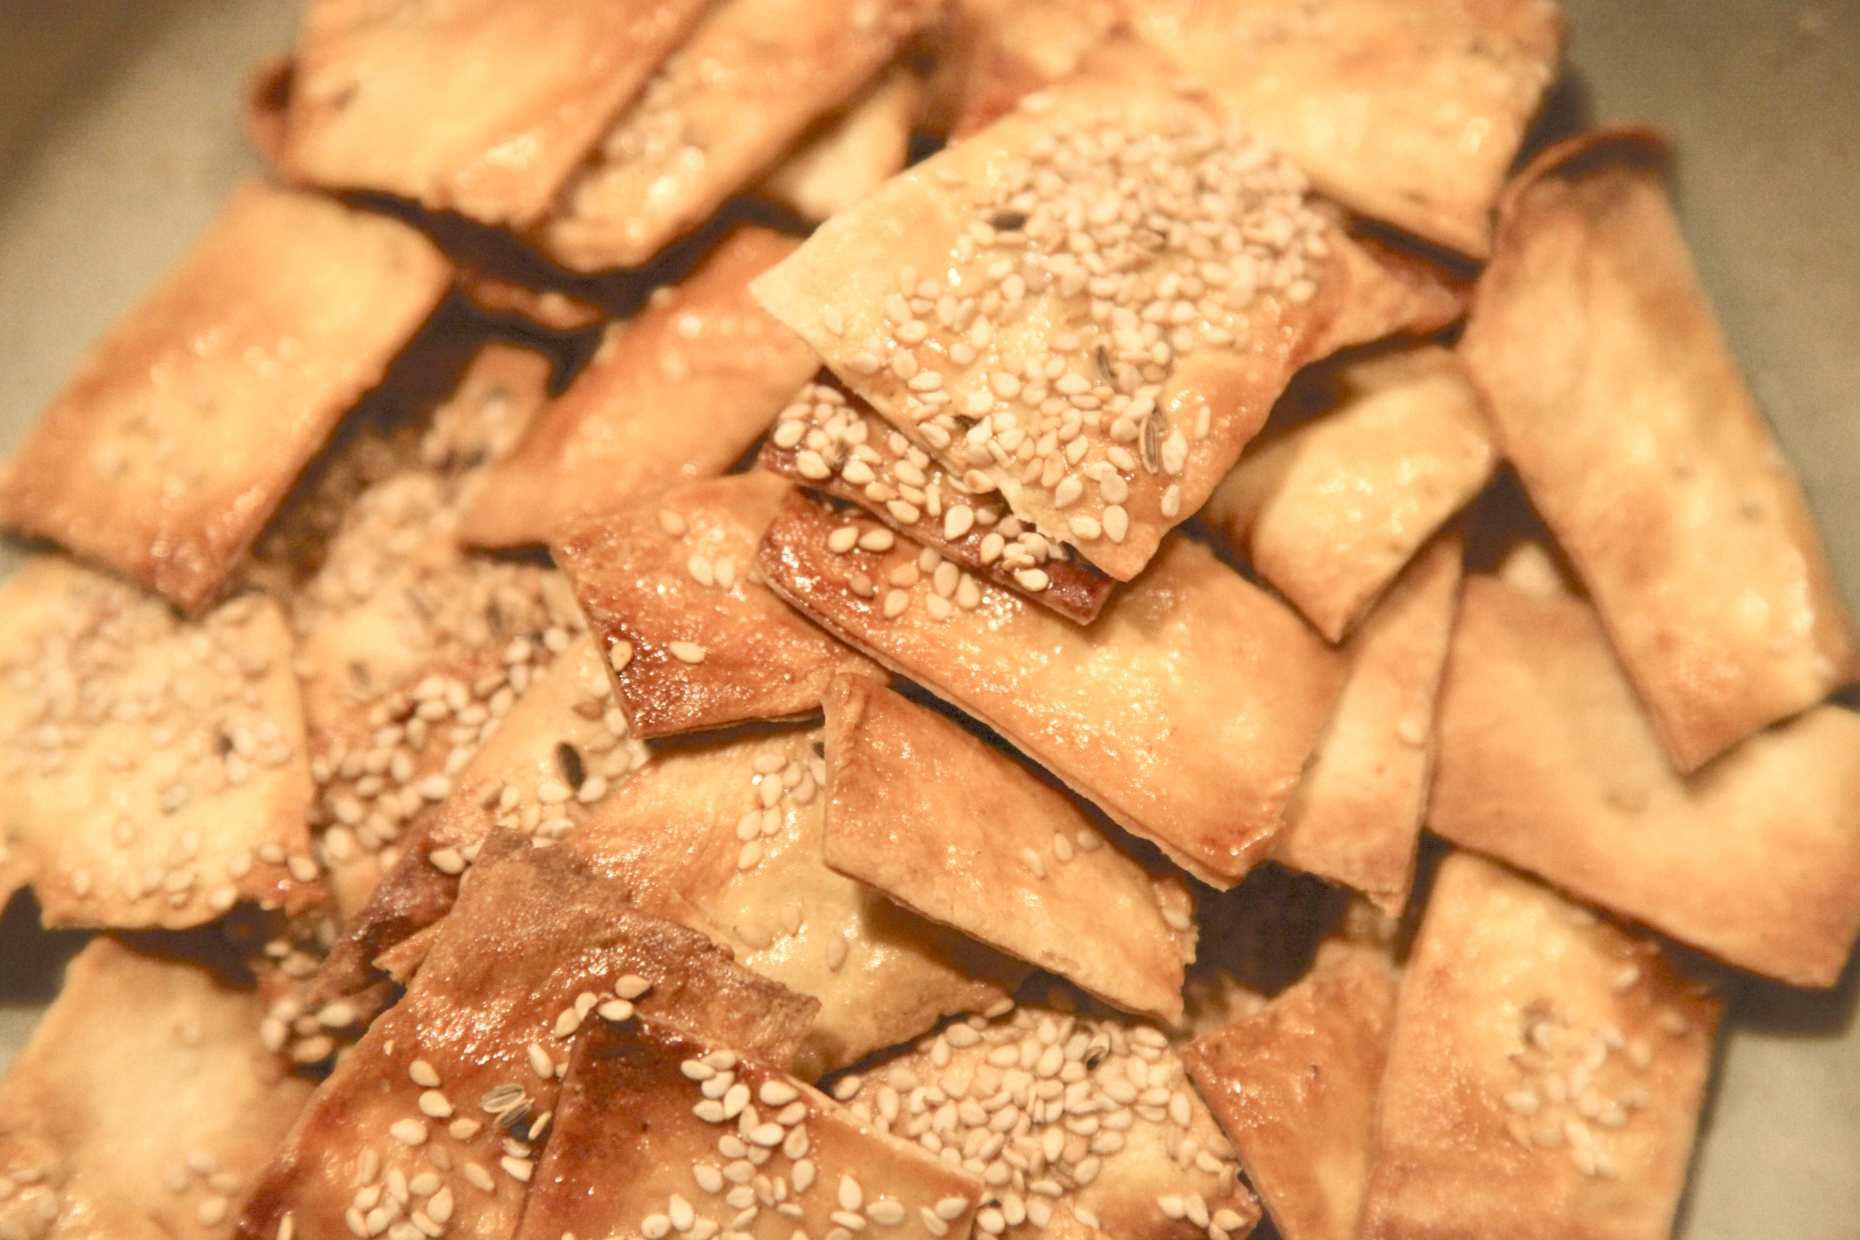 Homemade Seed Crackers, Recipe at Slim-Shoppin. Photo © Liesl Clark